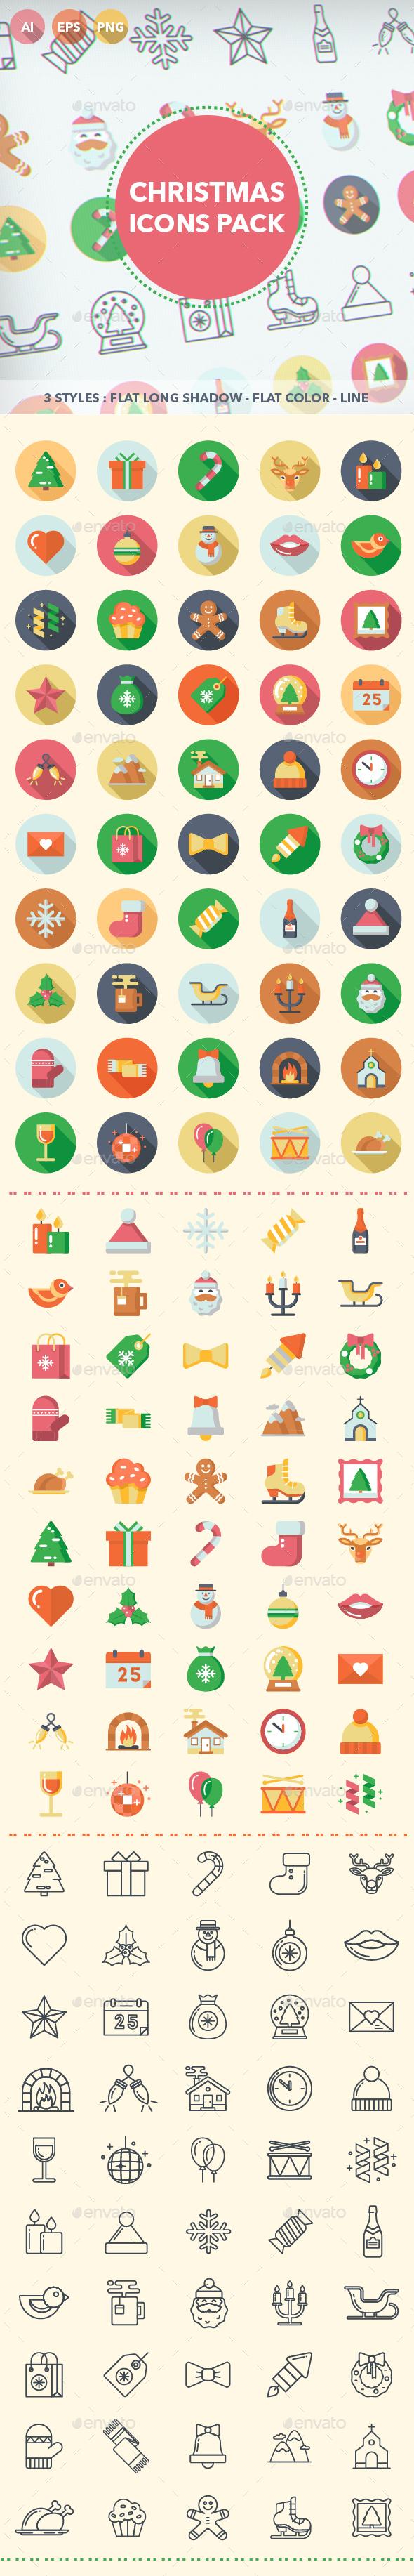 Christmas Icons Pack - Seasonal Icons